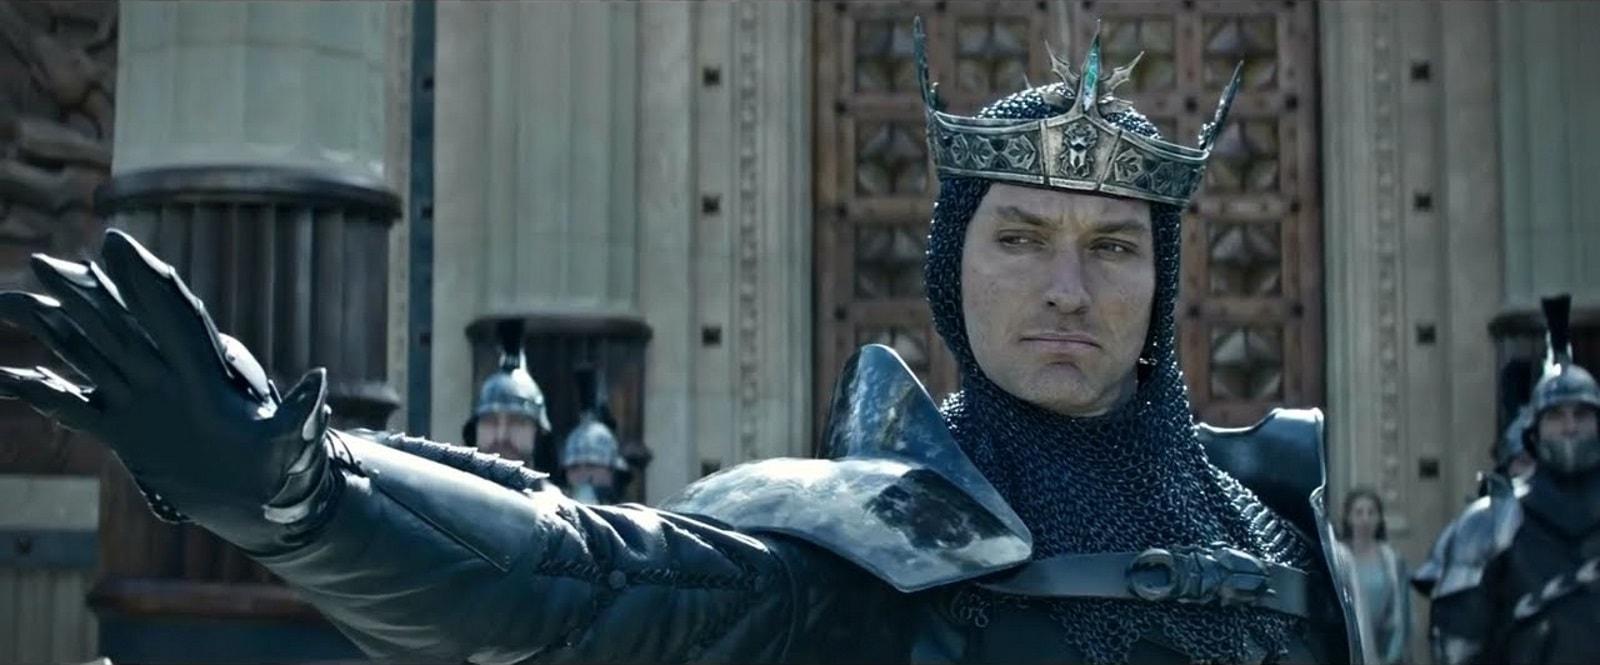 King Arthur: Legend of the Sword Backgrounds